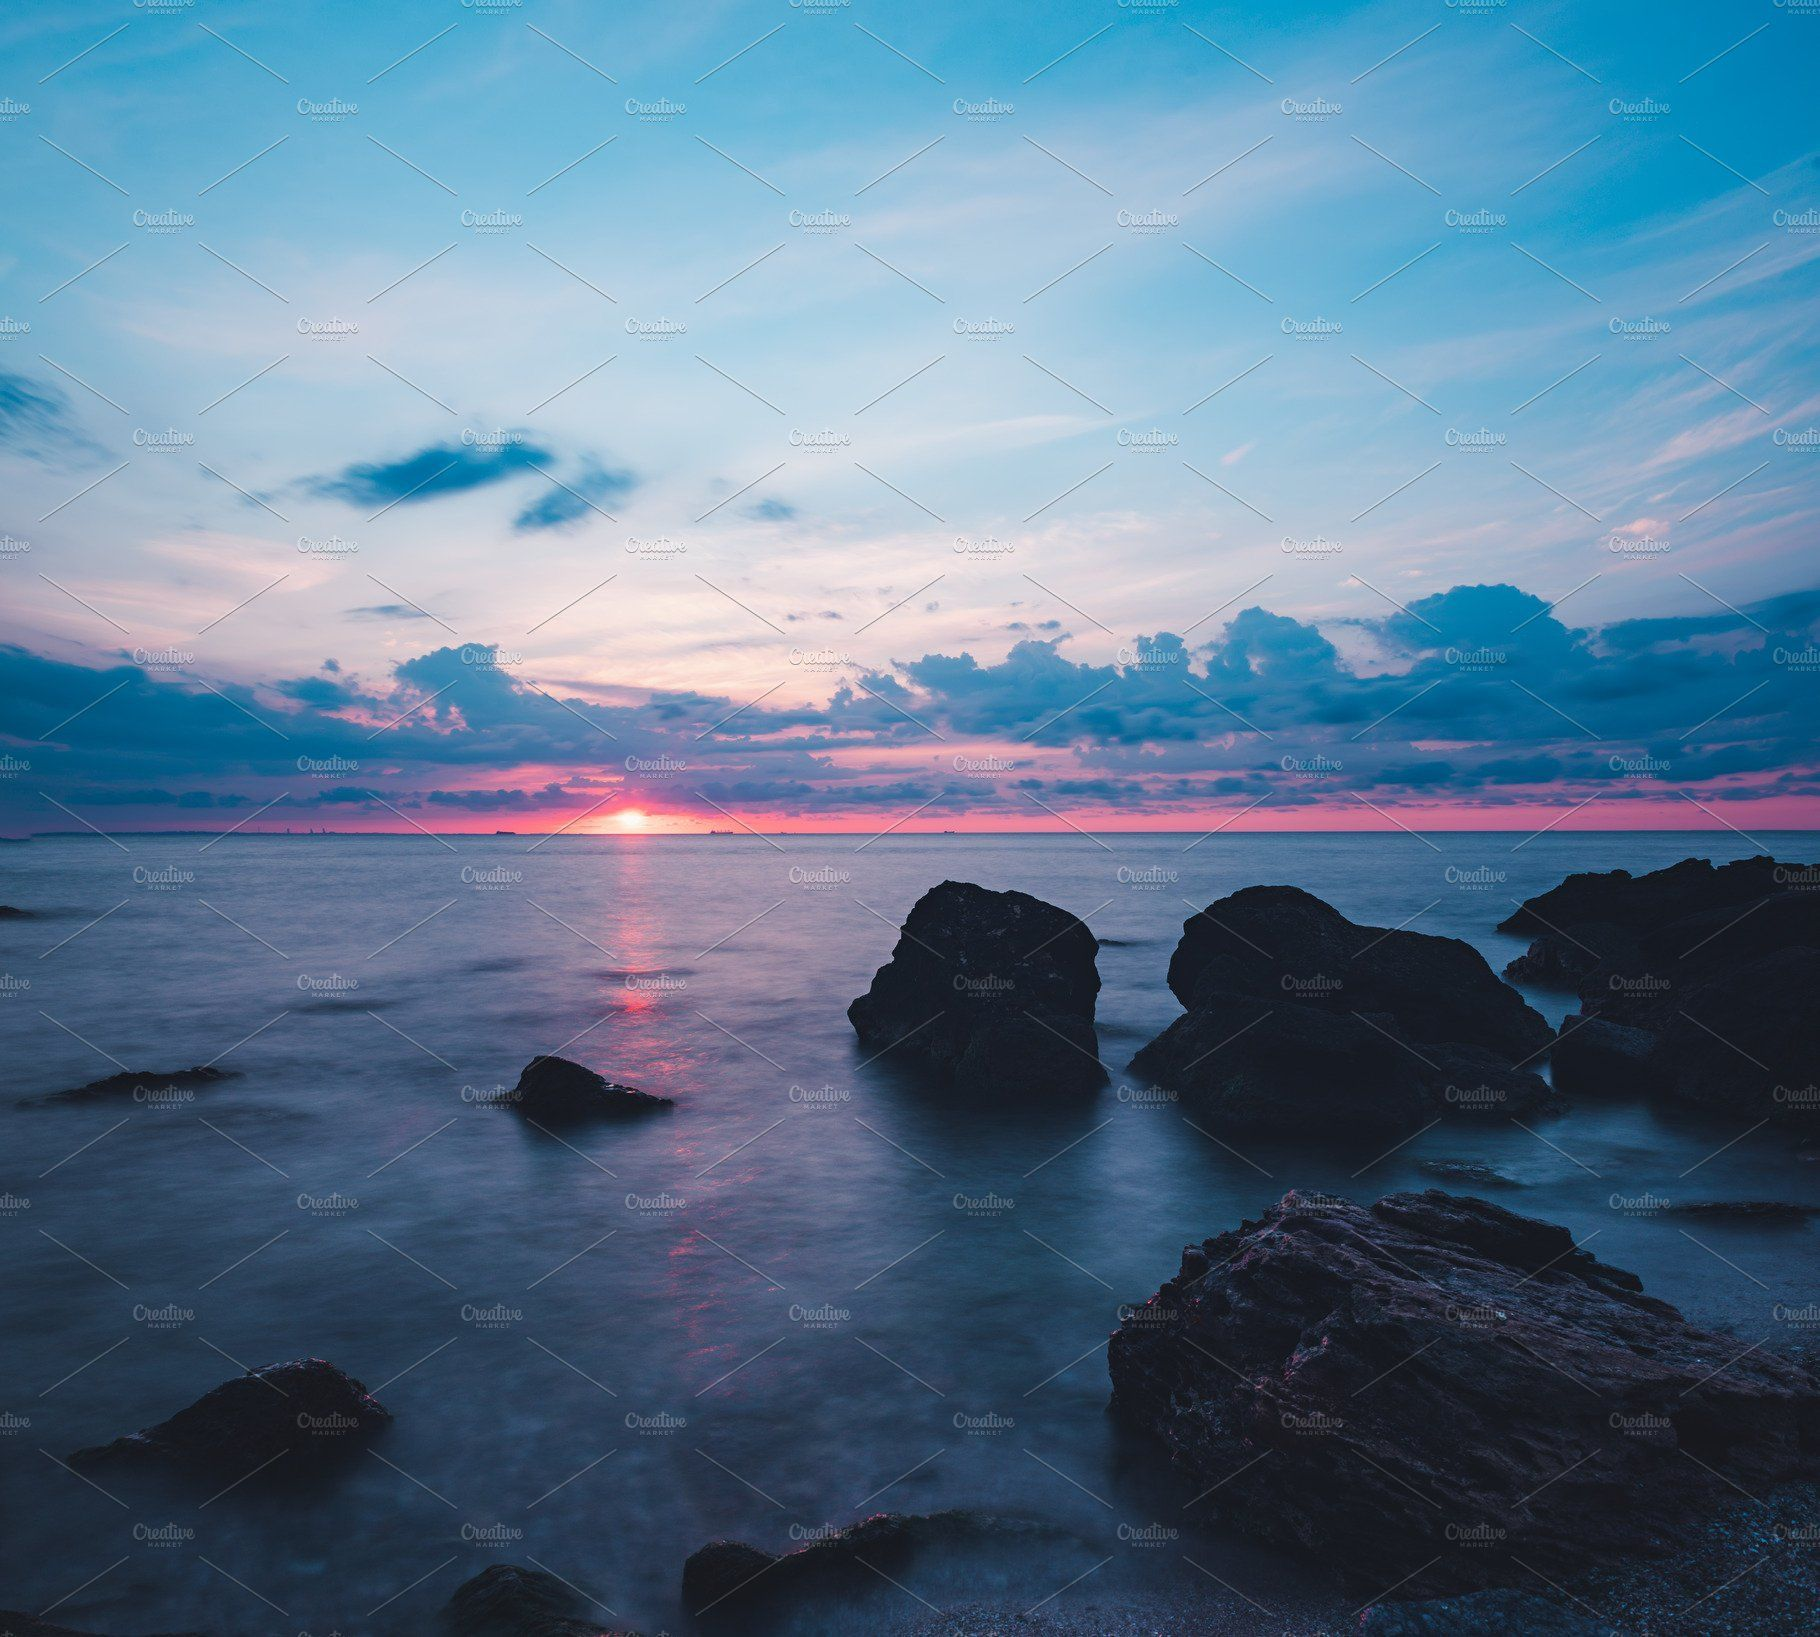 Sunrise At Sea Landscape Scenery Colorful Landscape Nature Photography